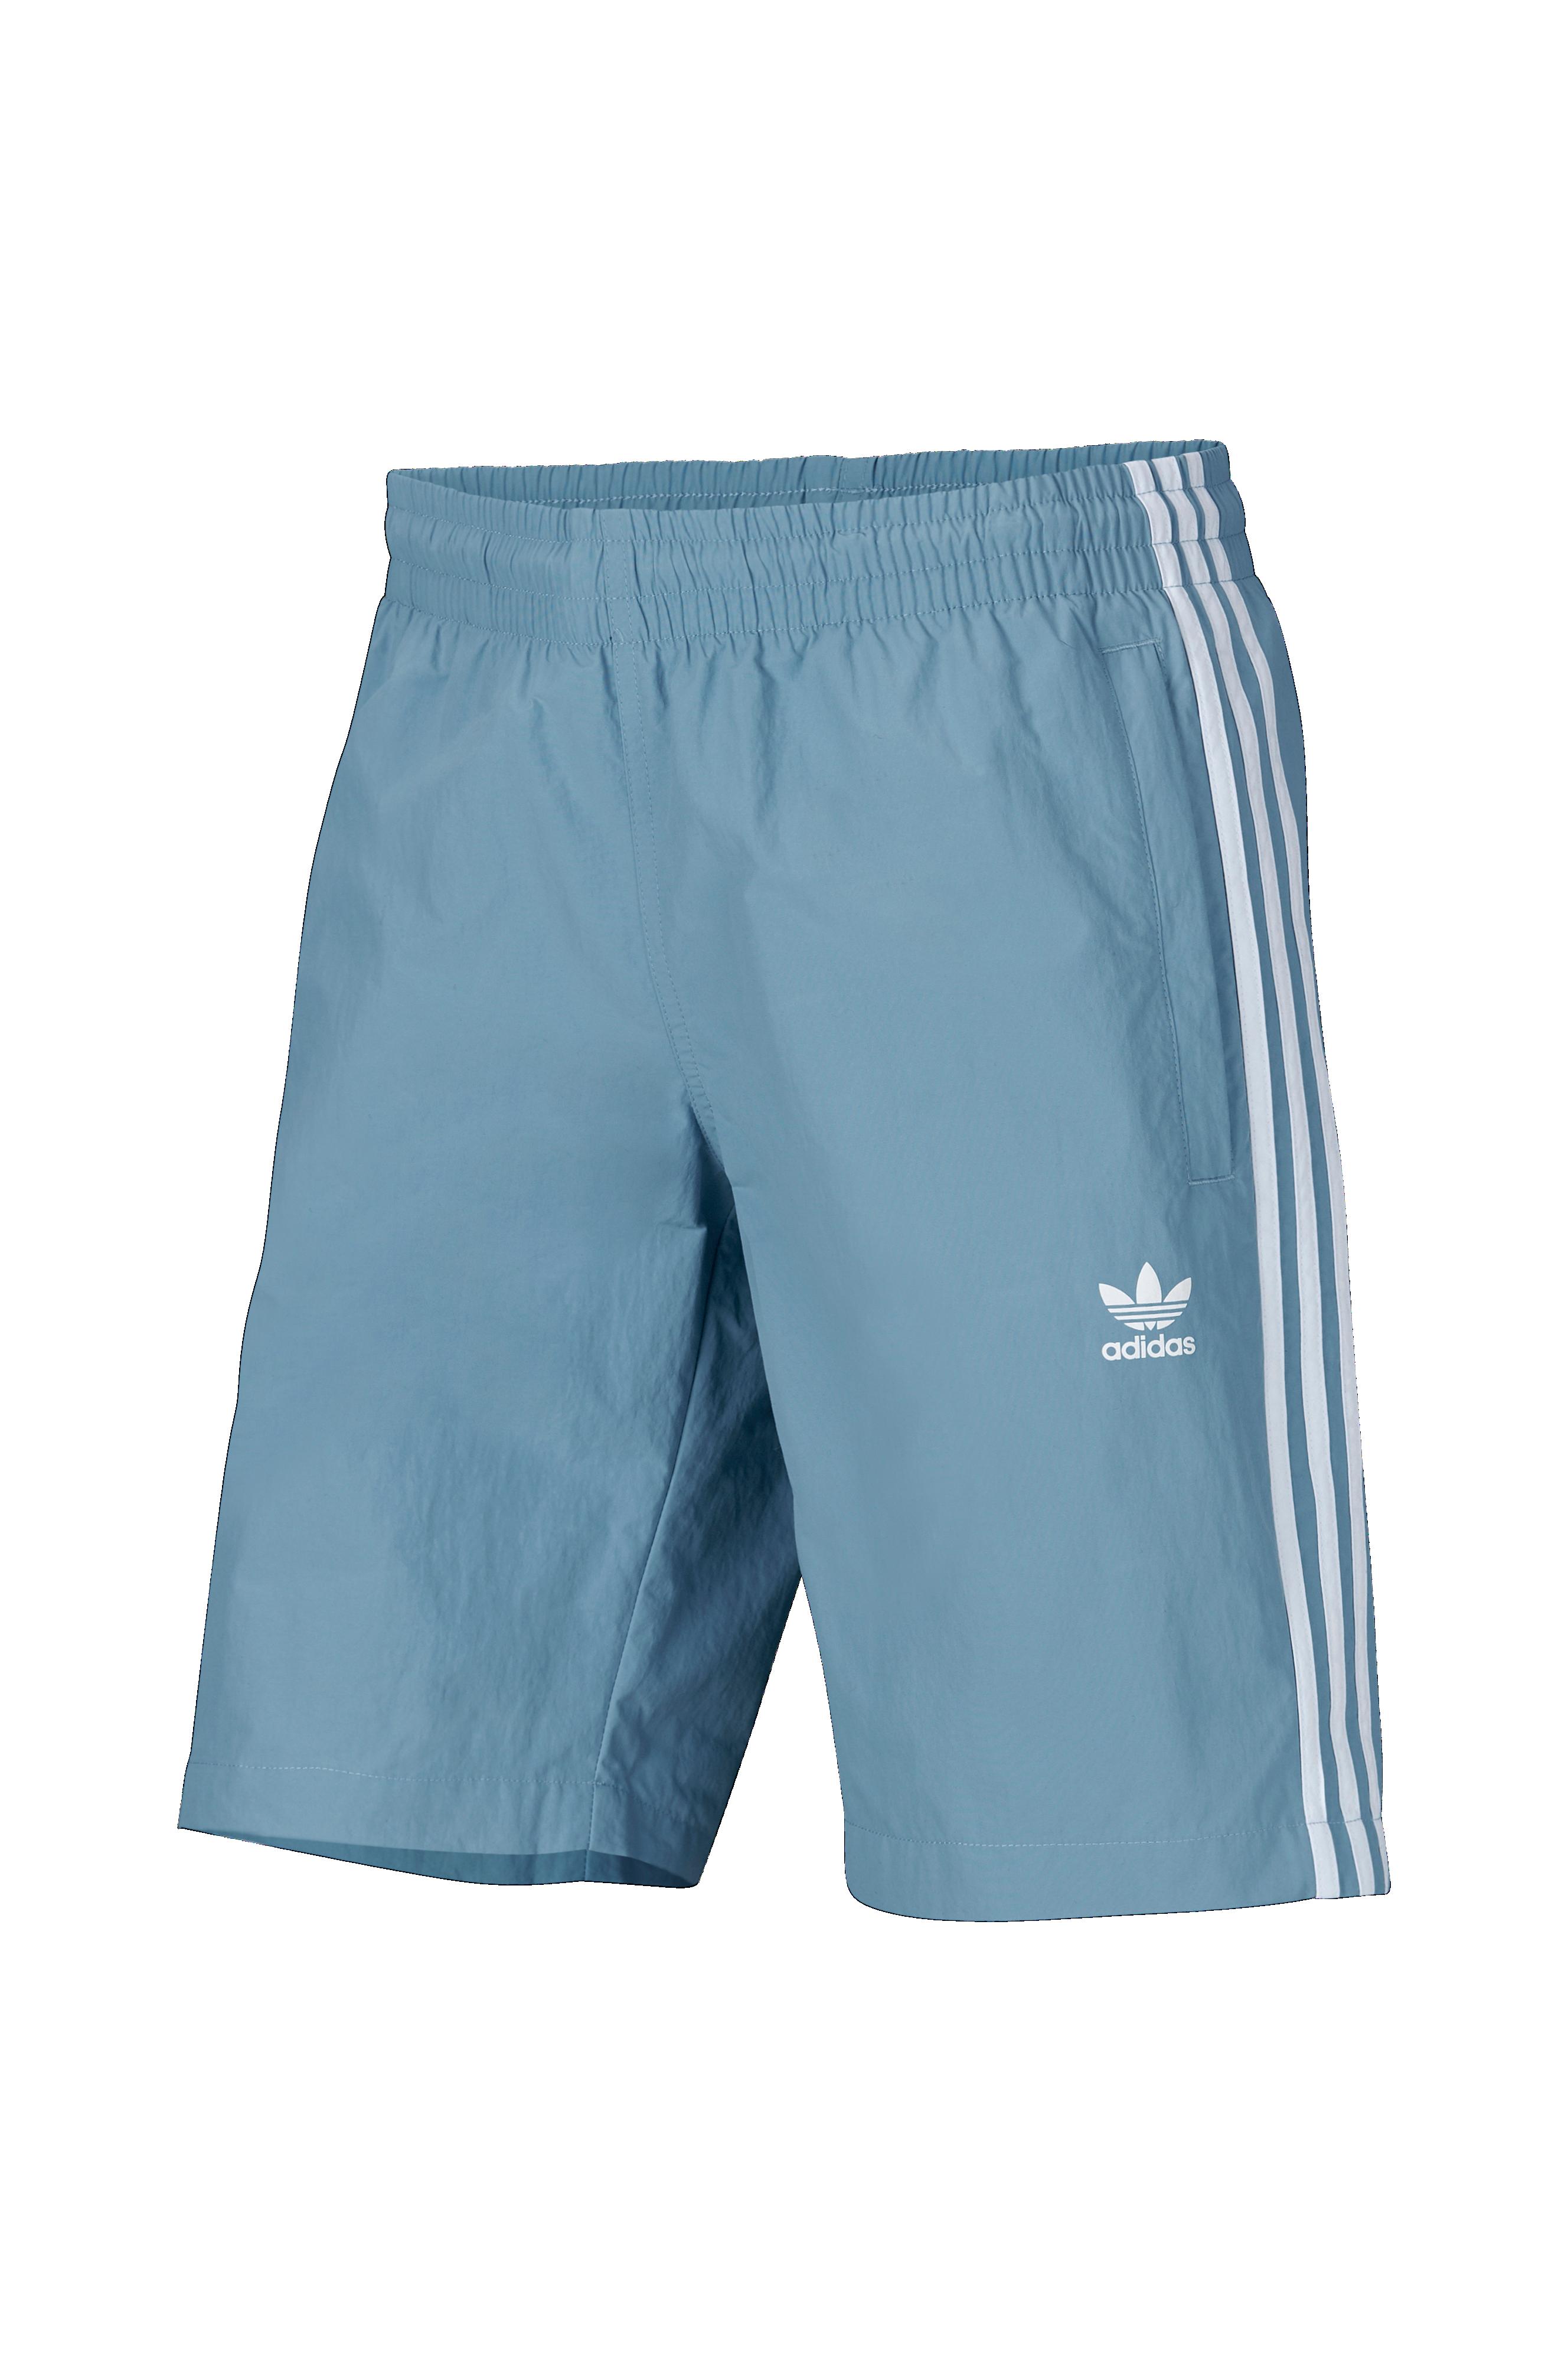 adidas Originals 3-Stripes Swim -uimashortsit - Sininen - Miehet - Ellos.fi 2c60556549